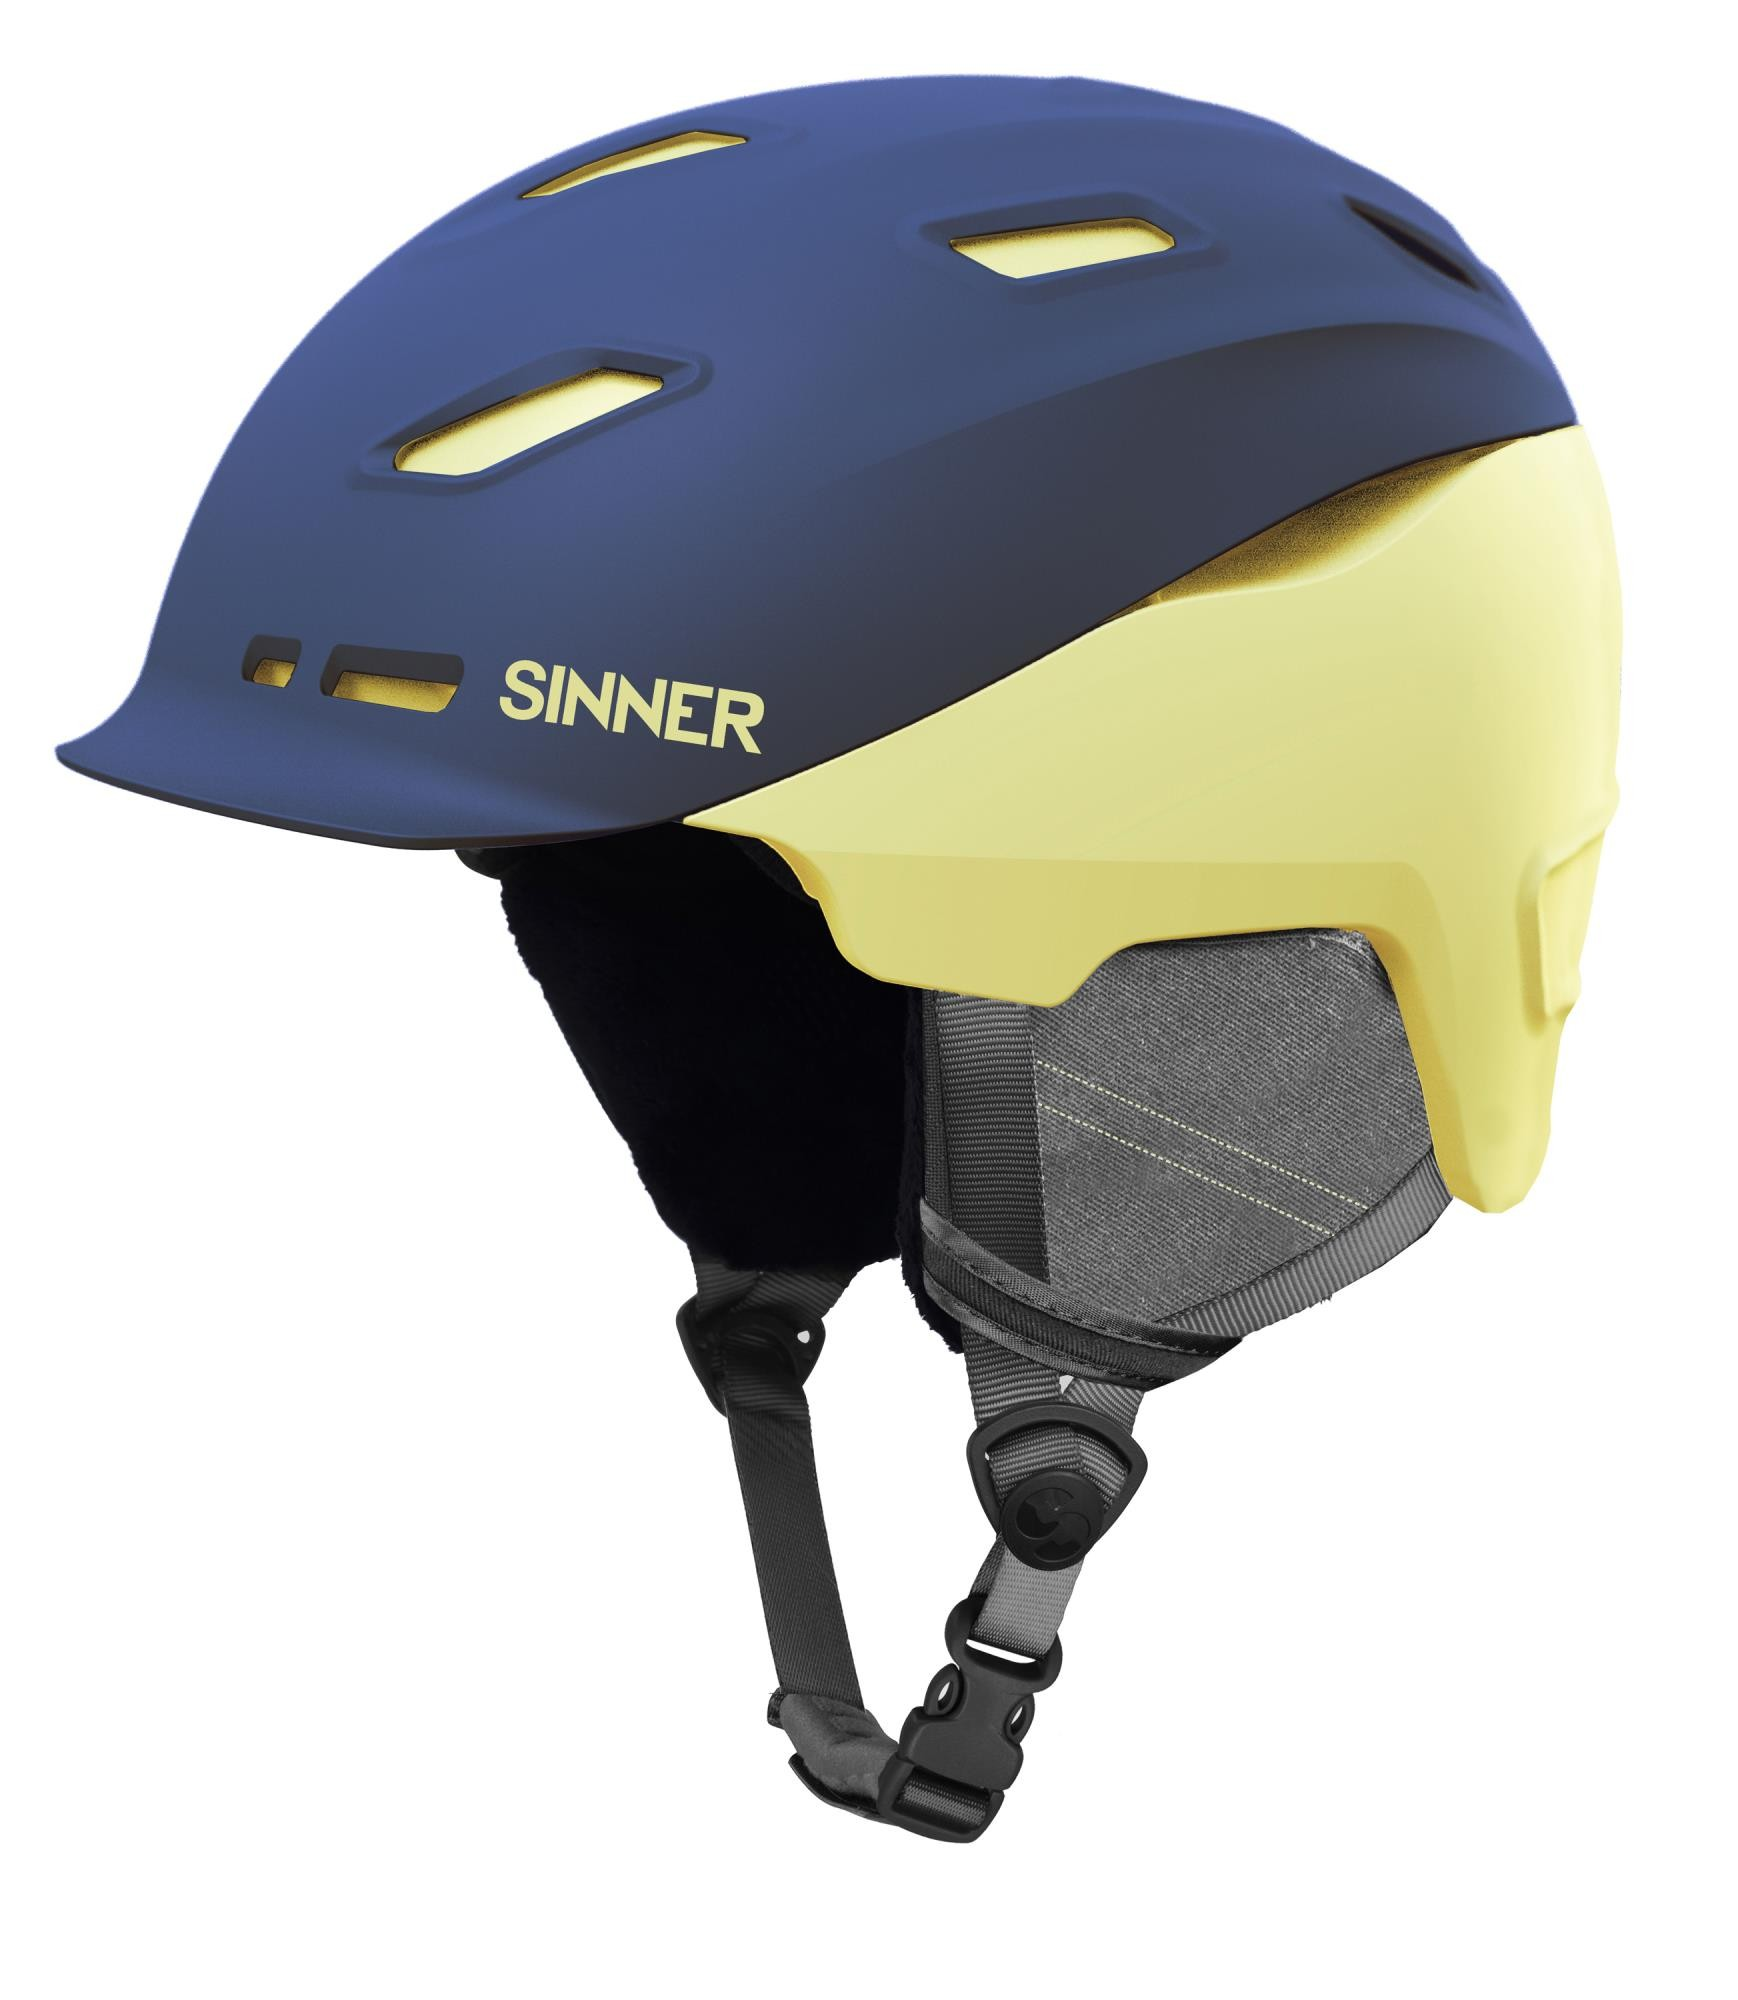 Sinner Moonstone Skihelm - Mat Donkerblauw/geel - Maat 61 - L